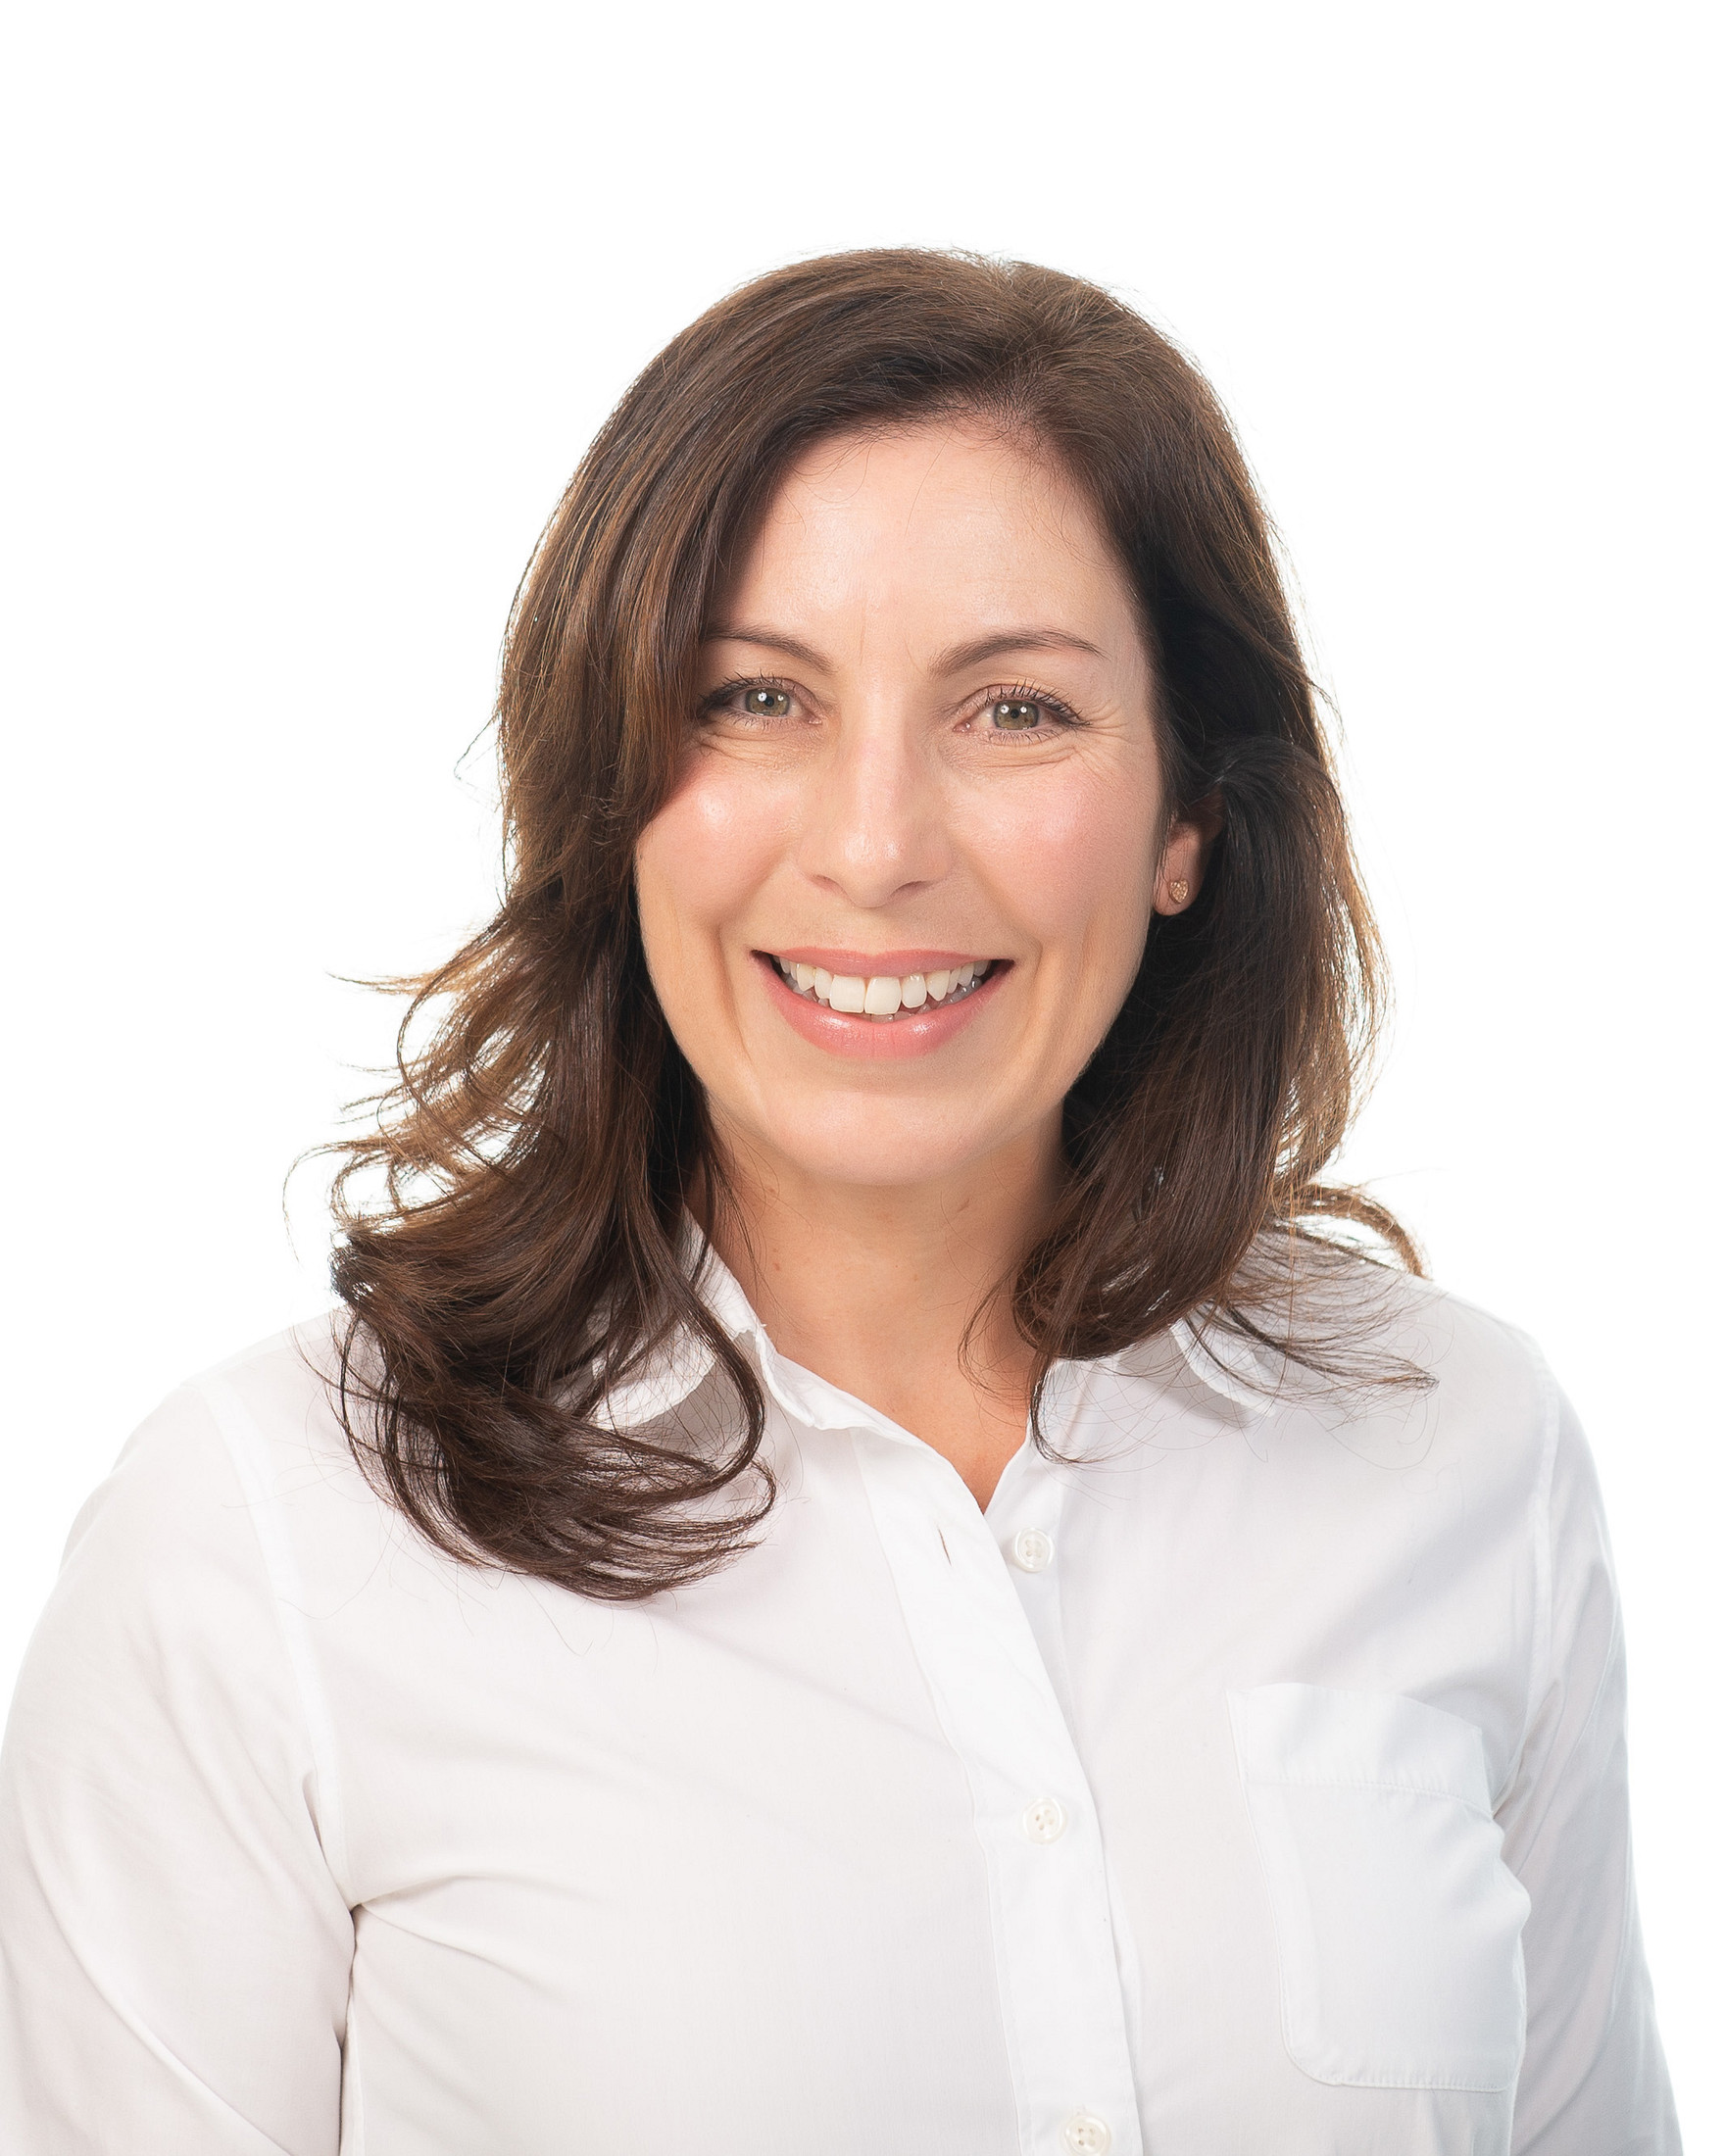 BlockChain Tech Specialist, AgriDigital: Emma Weston